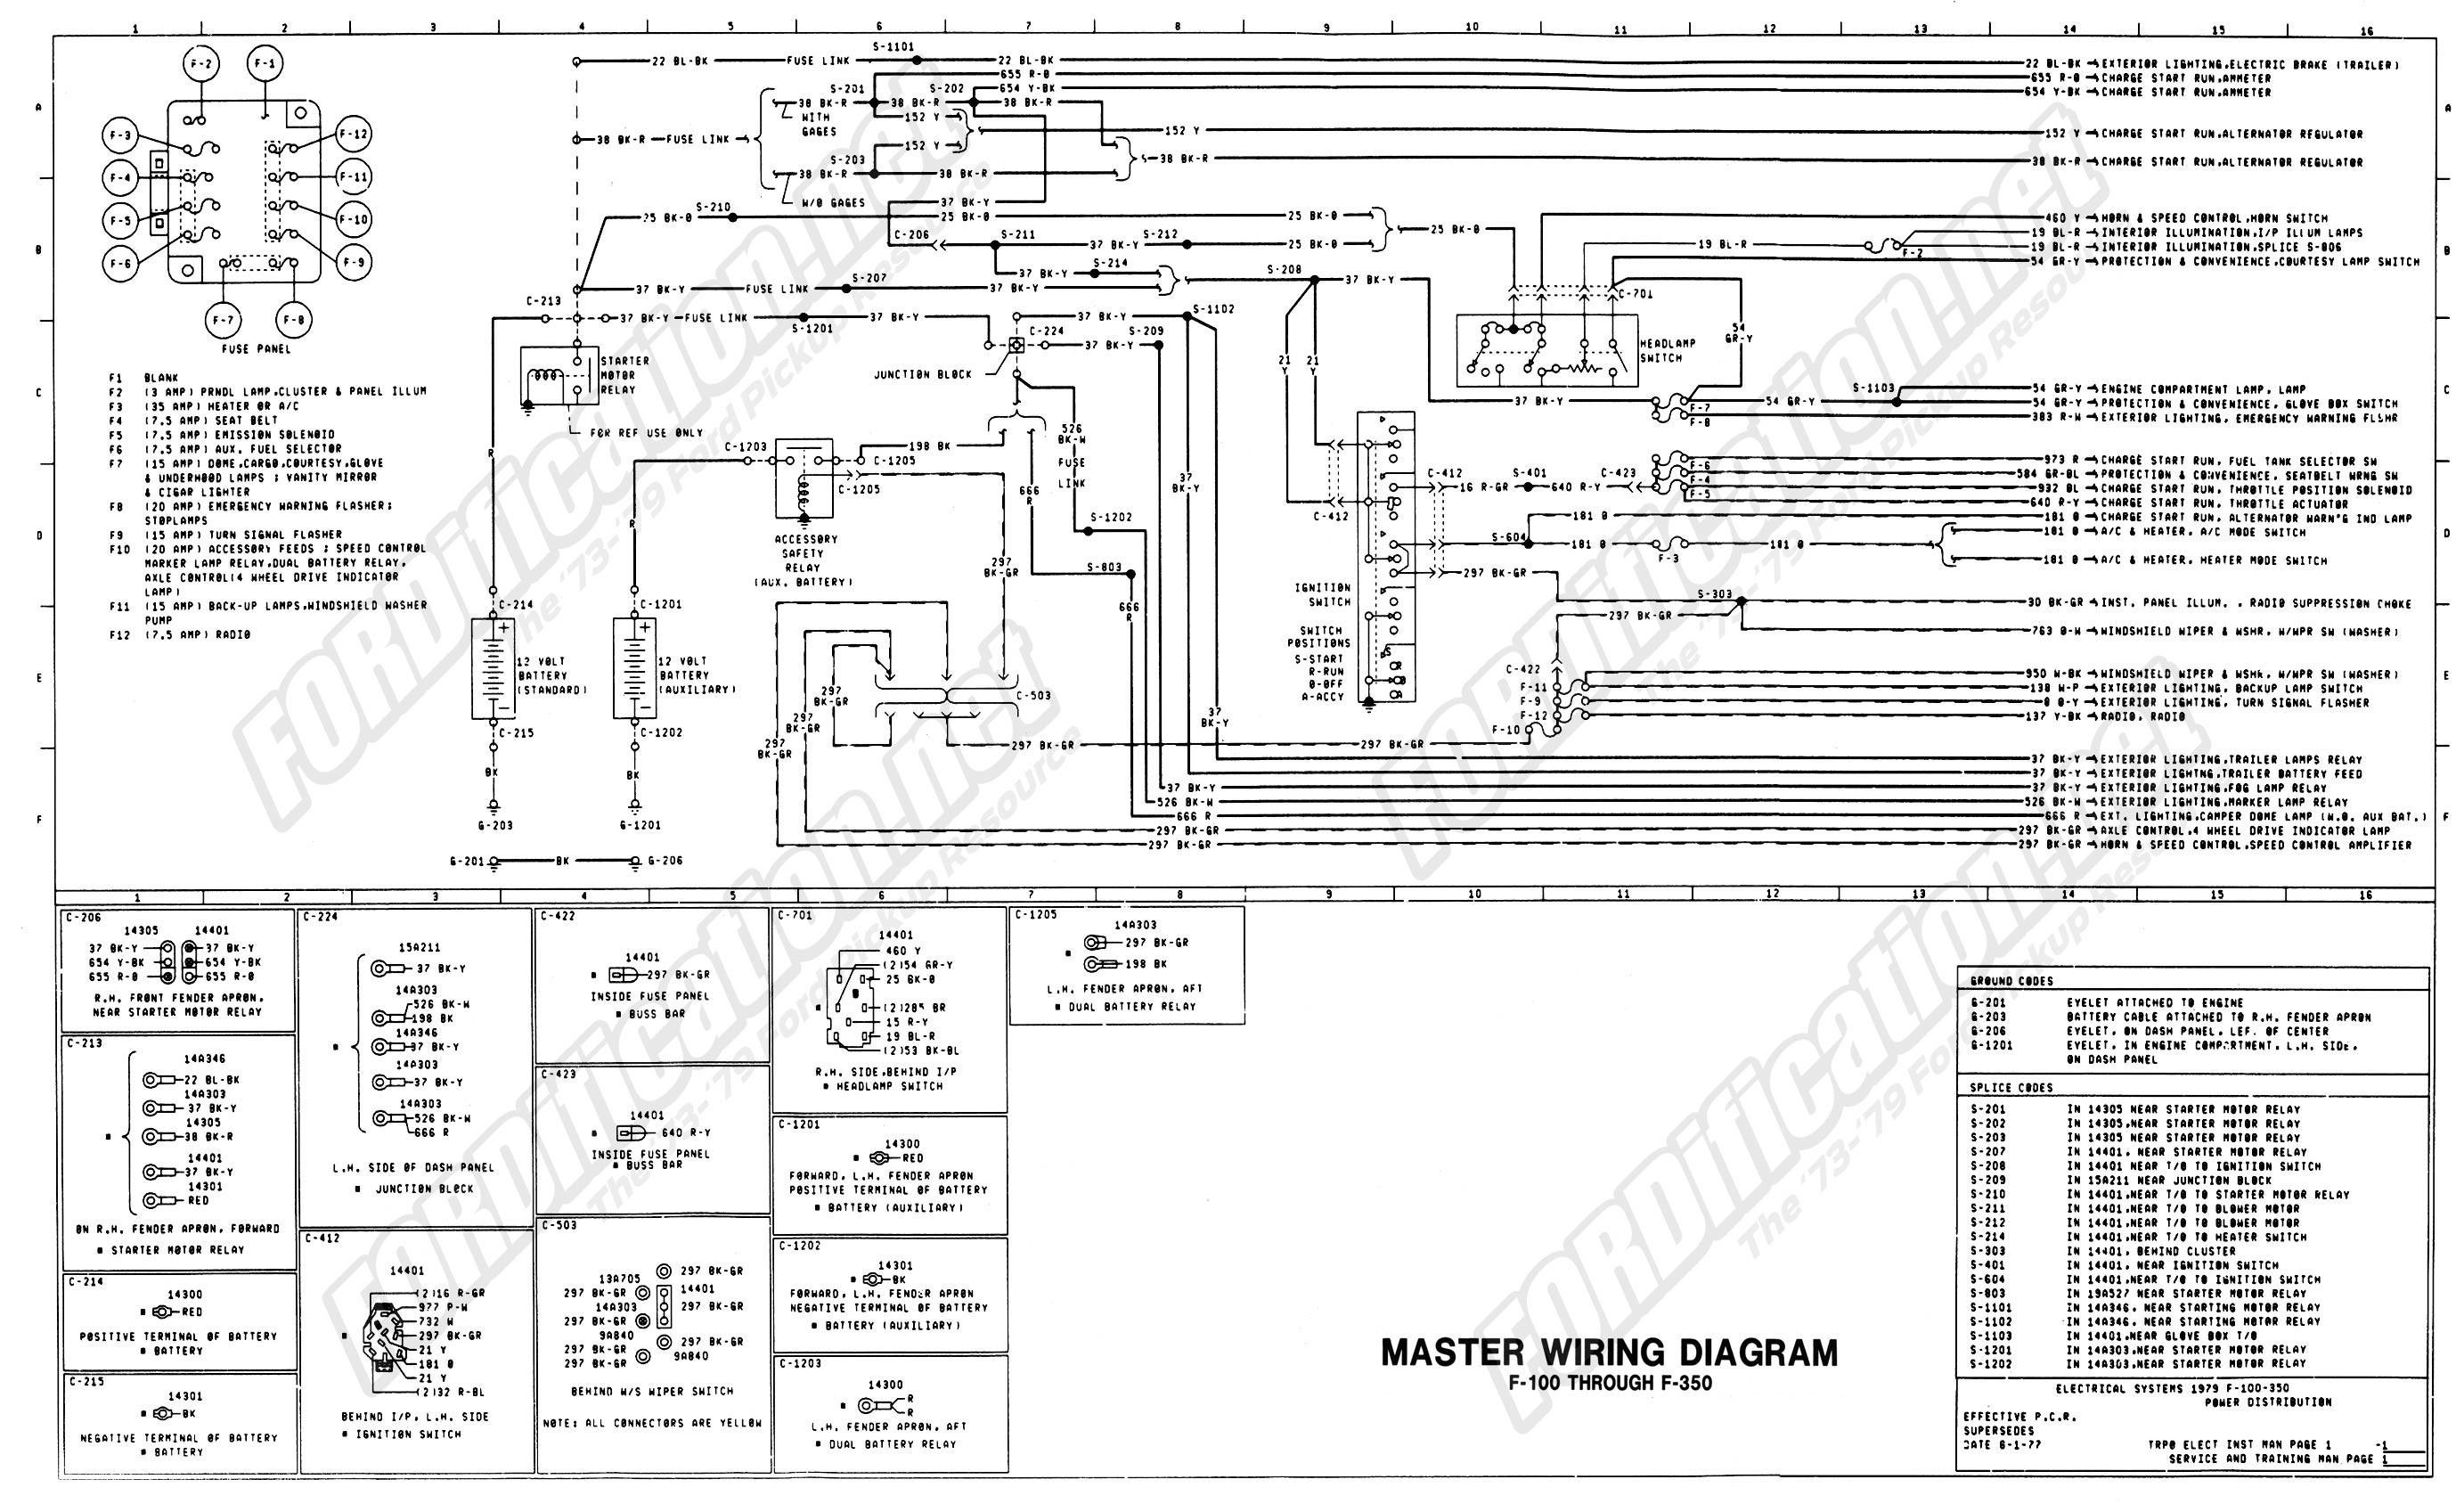 International Truck Wiring Diagram Elegant Wiring Diagram International Wiring Diagram Pic Cool Pdf